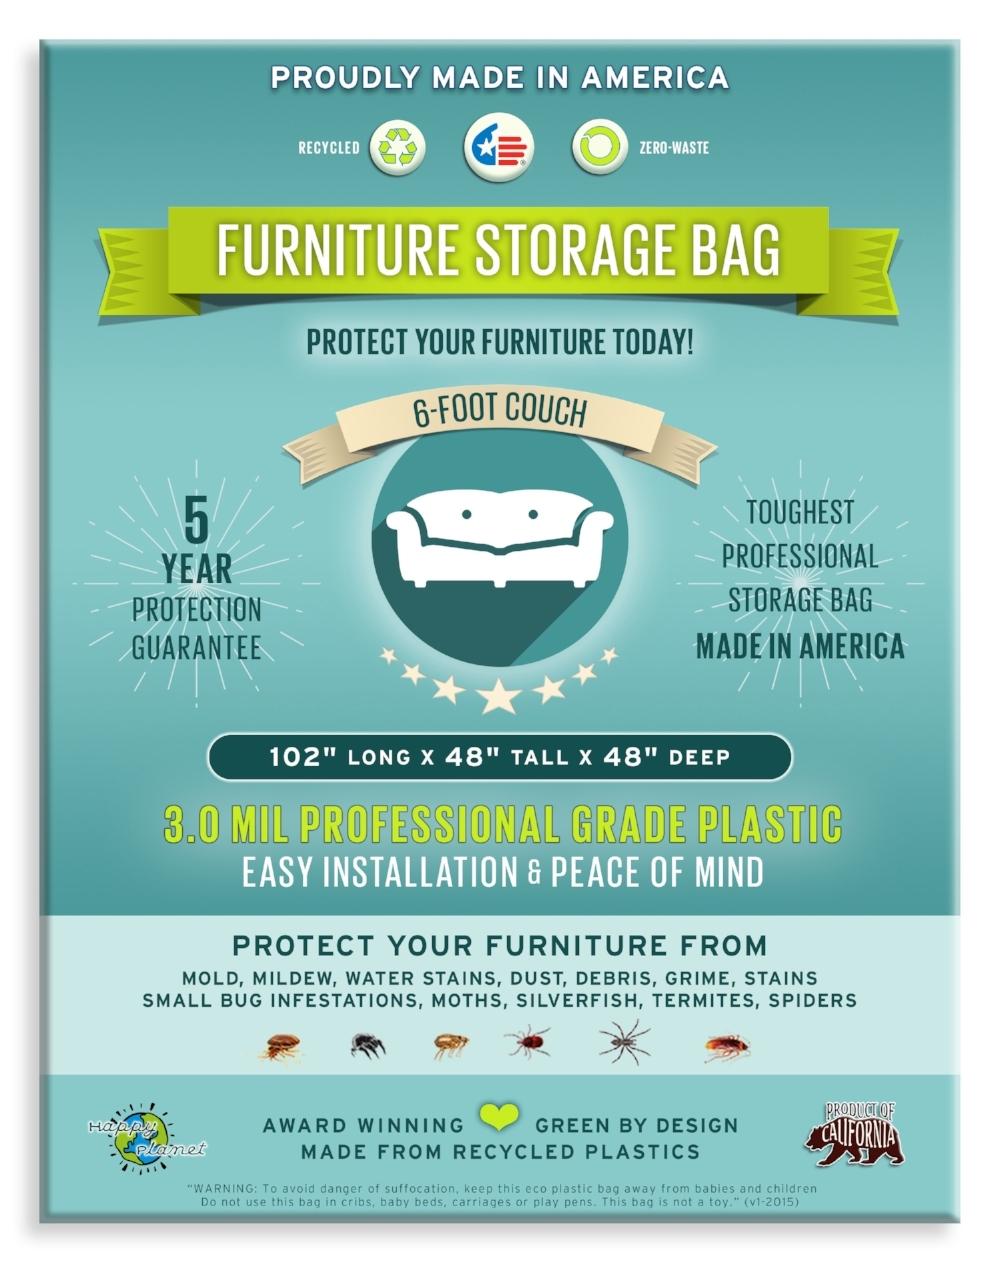 6 Foot Couch Furniture Storage Bag.jpg